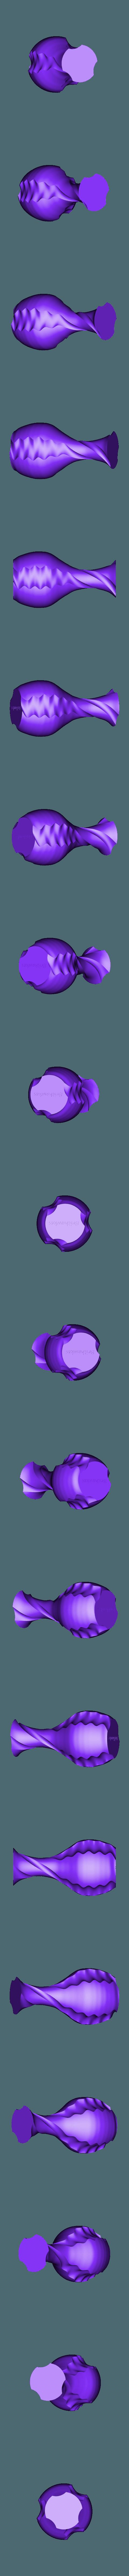 shake and twist vase.stl Download free STL file Shake & twist vase • 3D printable design, Brithawkes